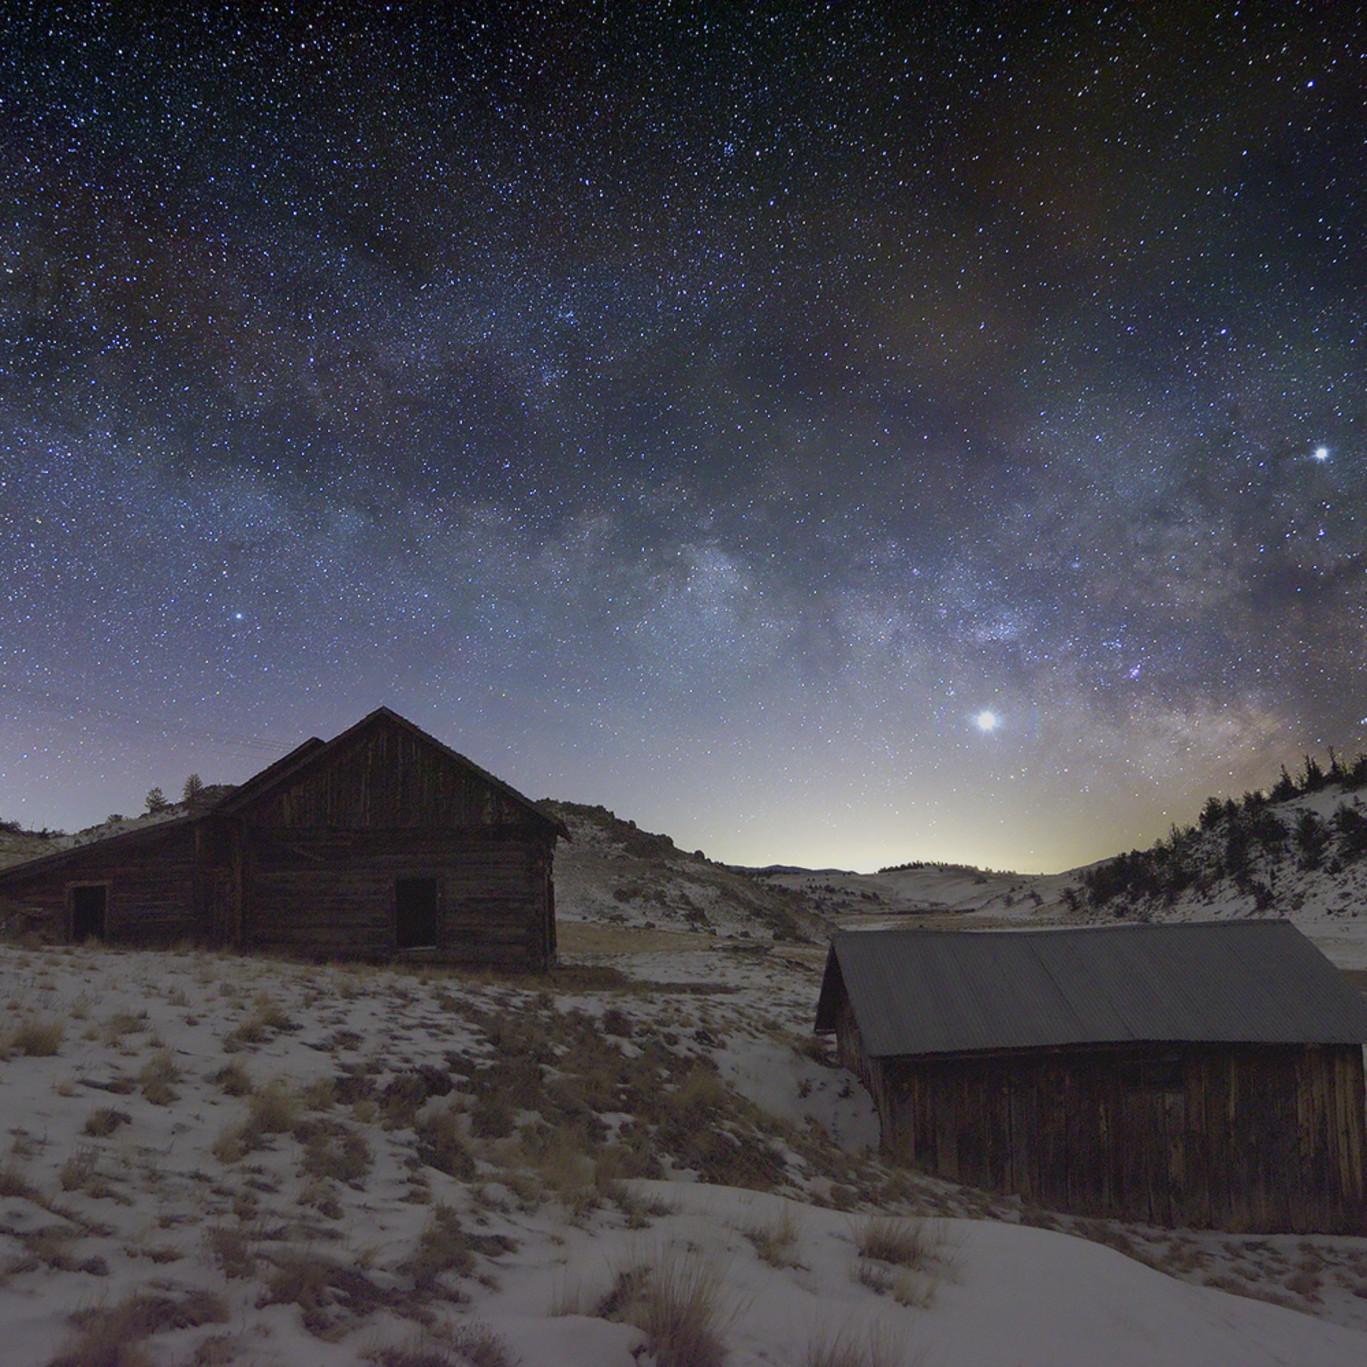 Milky way over wright homestead 1 dppaqb